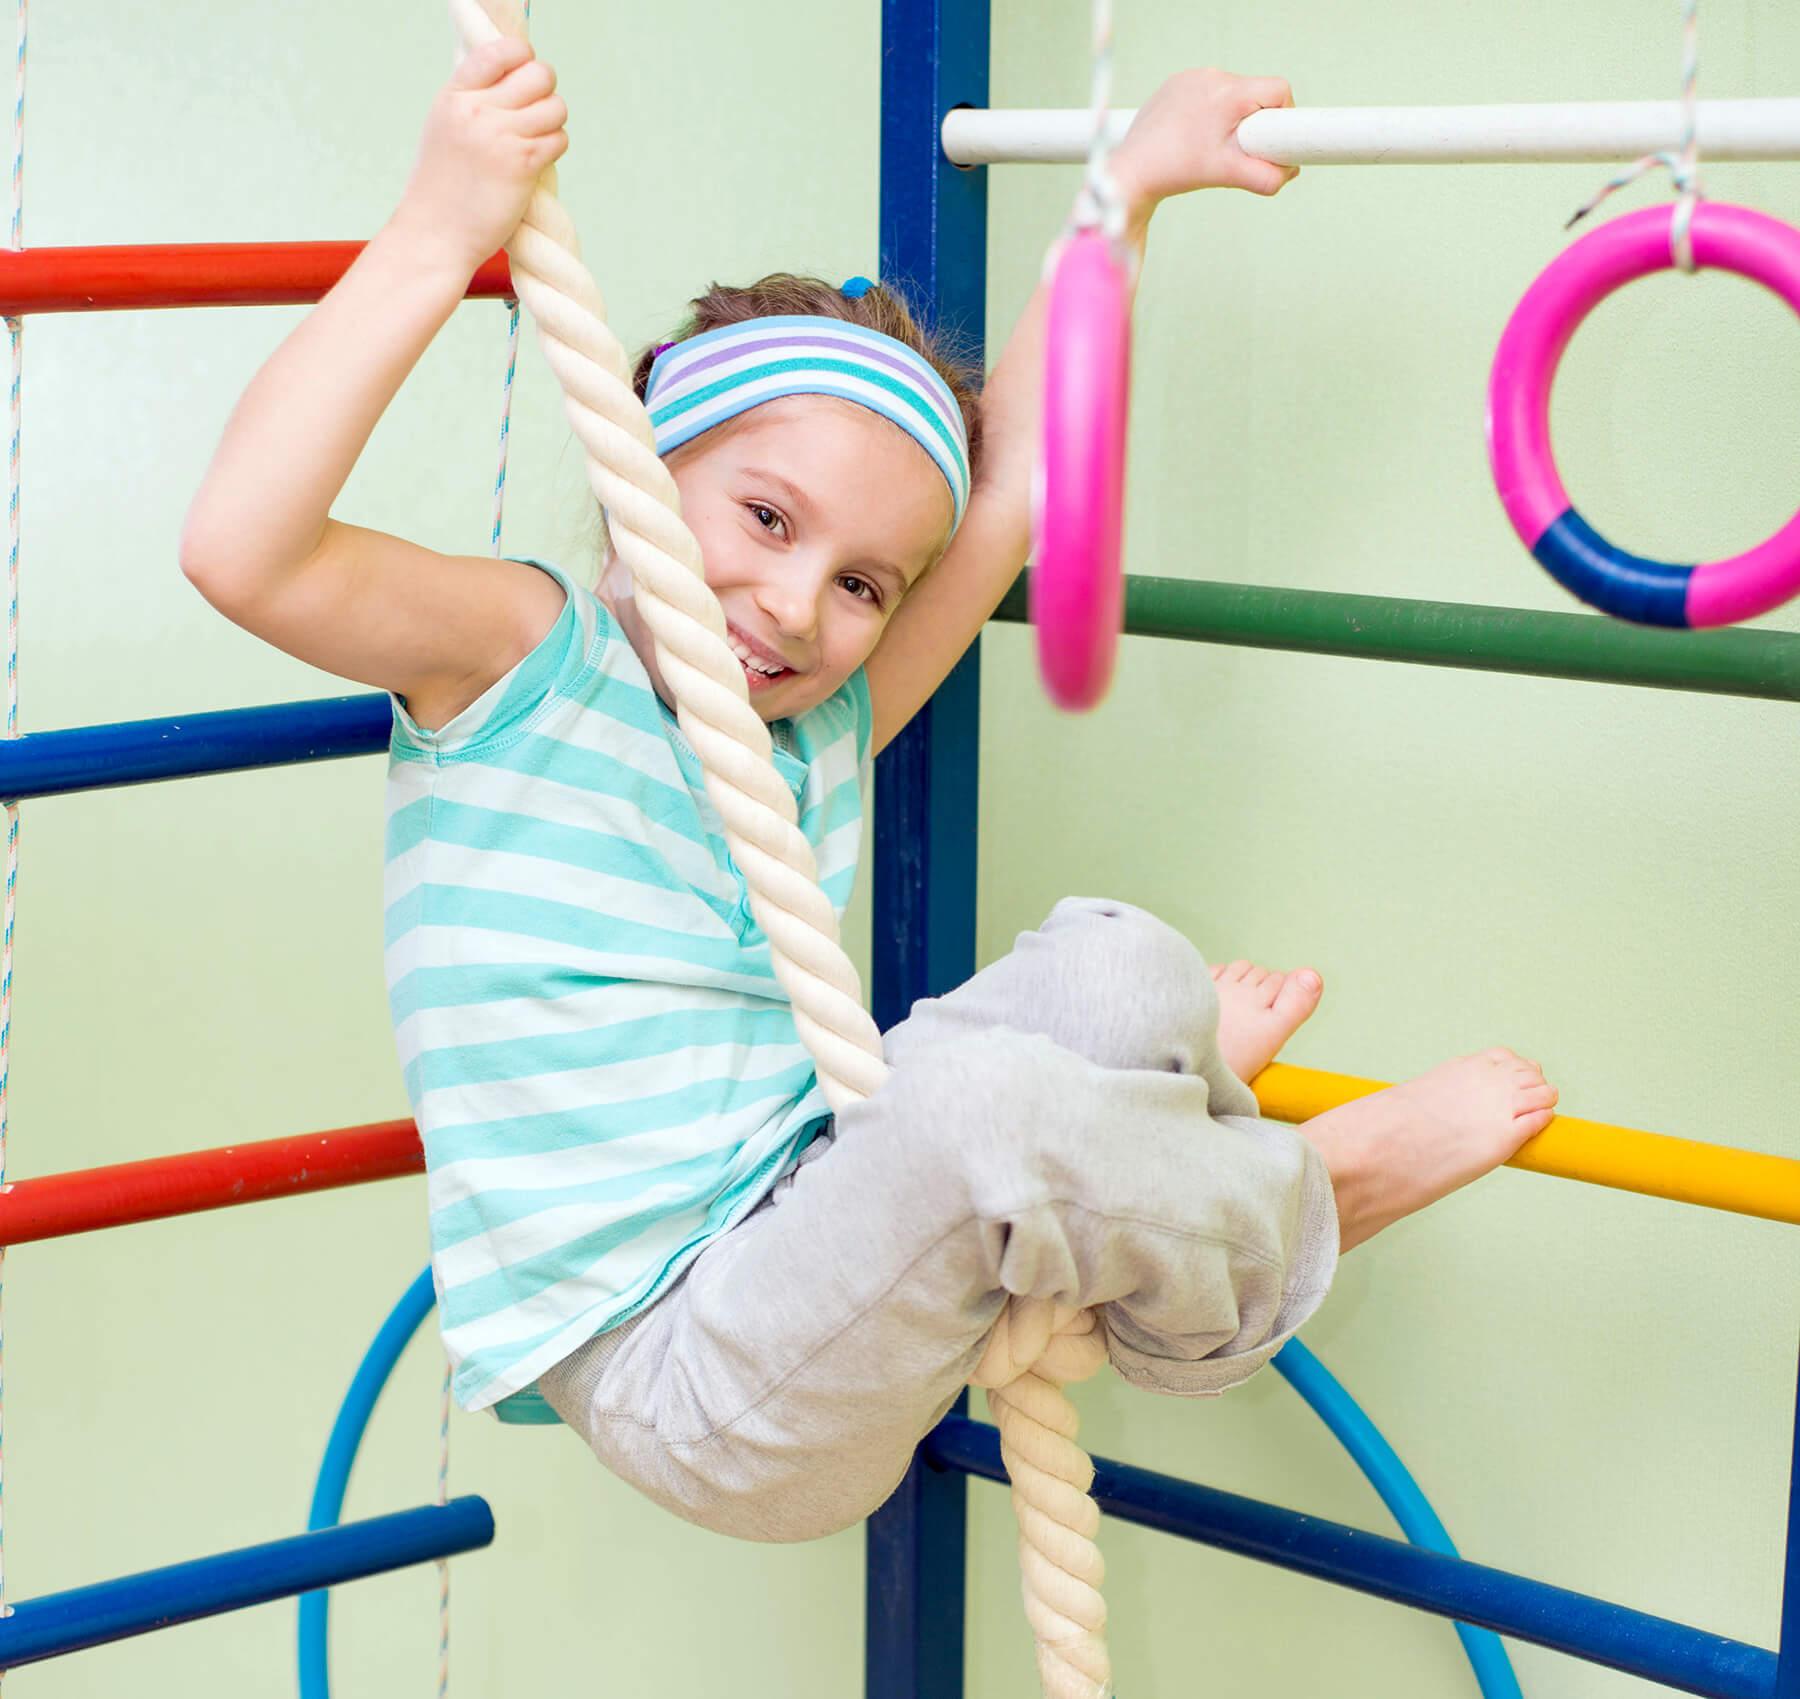 Girl climbing rope in gymnastics class